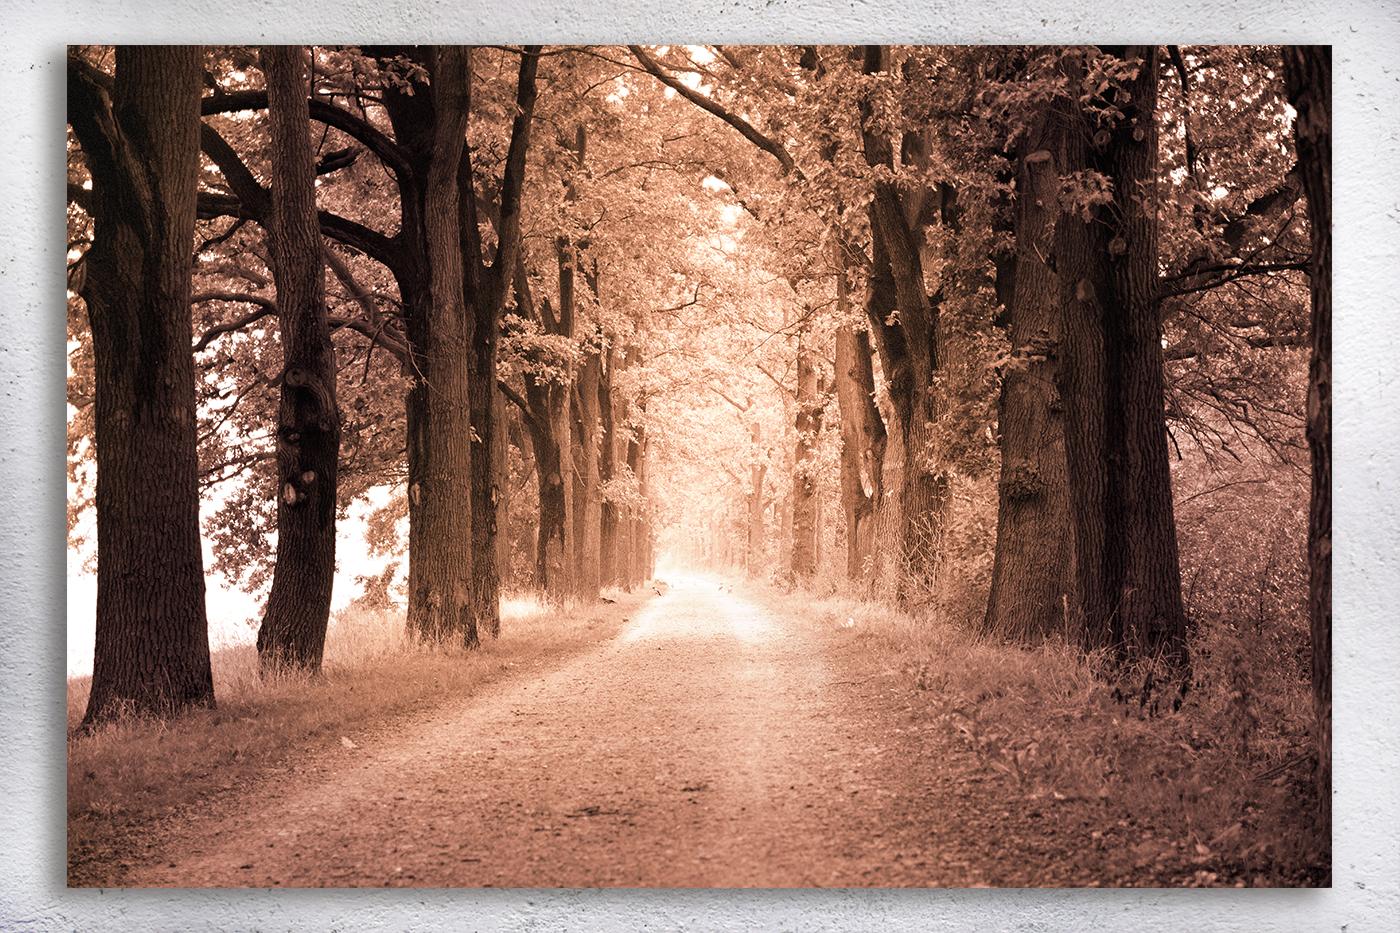 Nature photo, landscape photo, autumn alley photo, example image 3